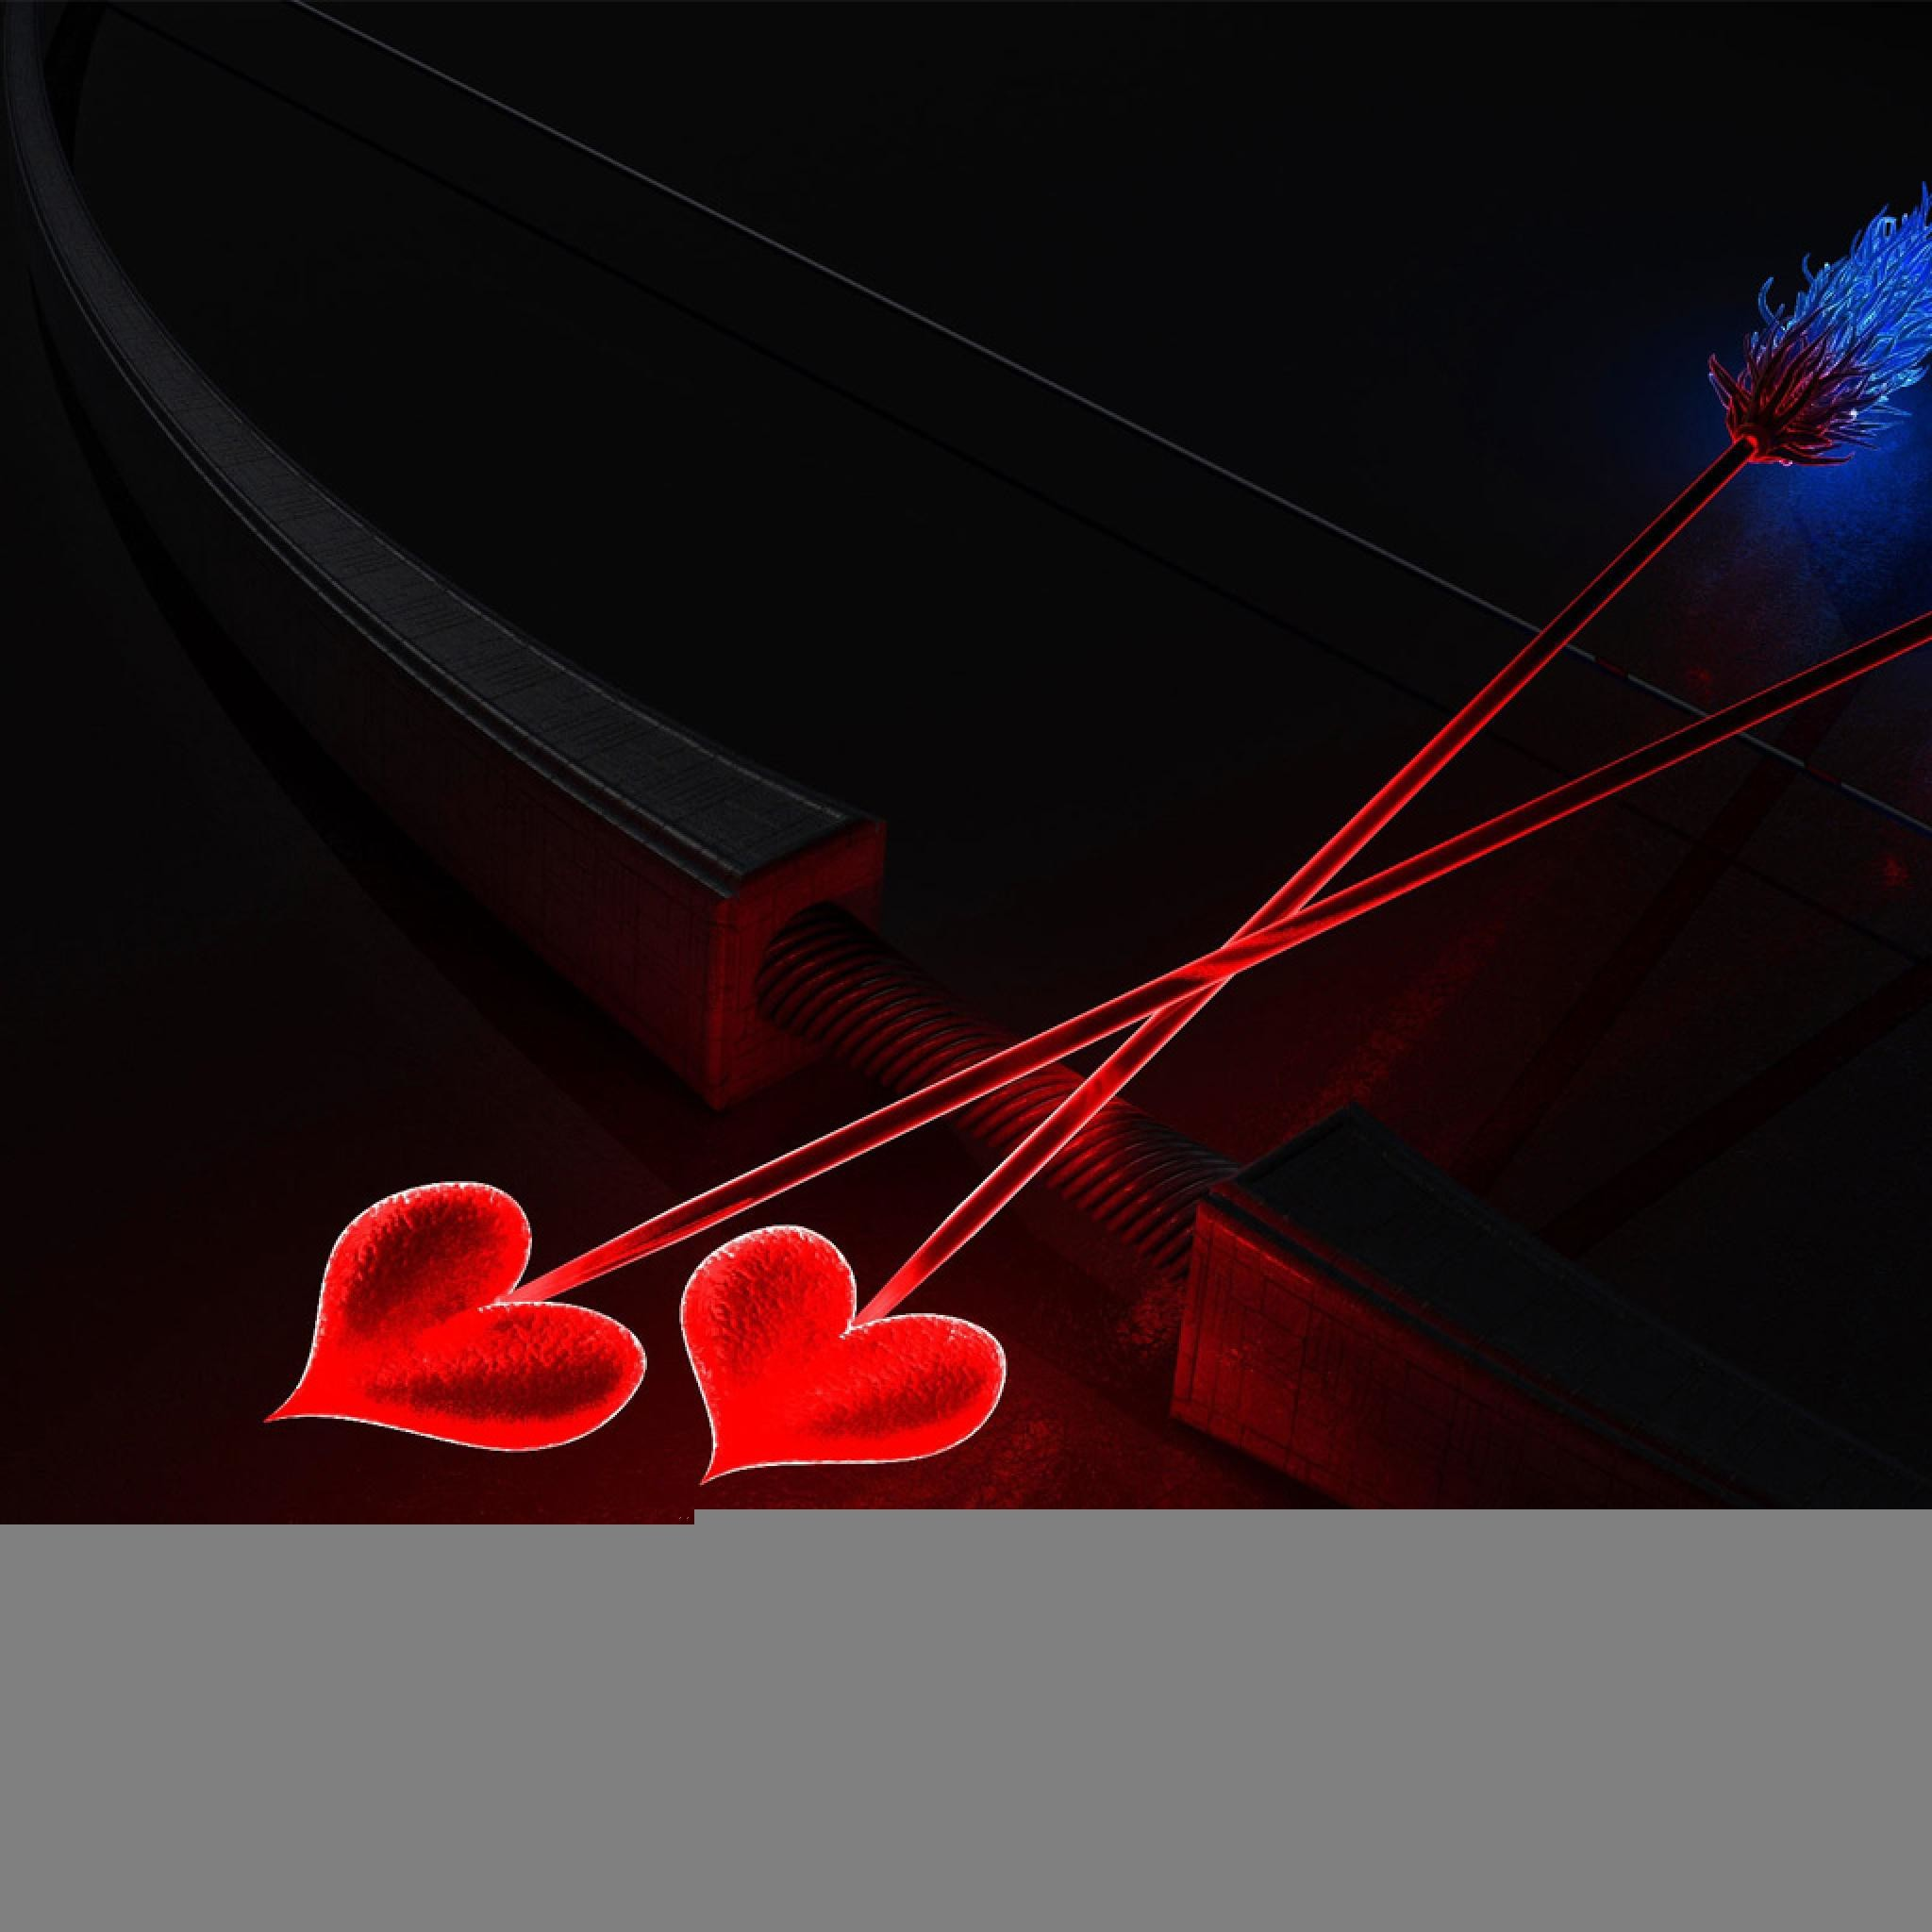 925 1: Valentine Arrows Heart Shaped iPad wallpaper